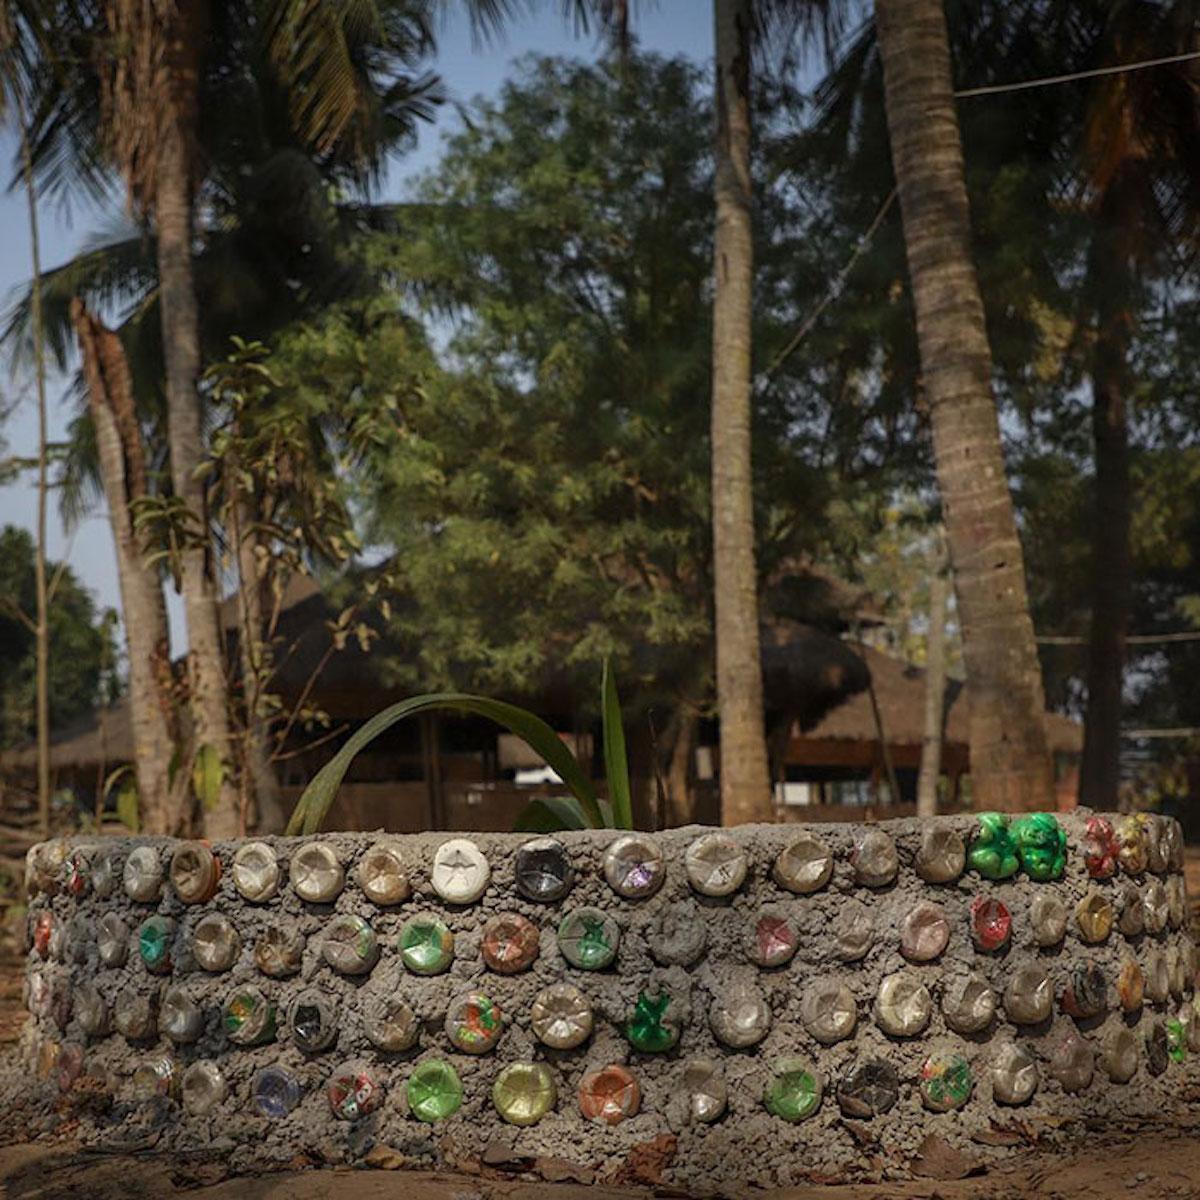 Recyclage Akshar Foundation